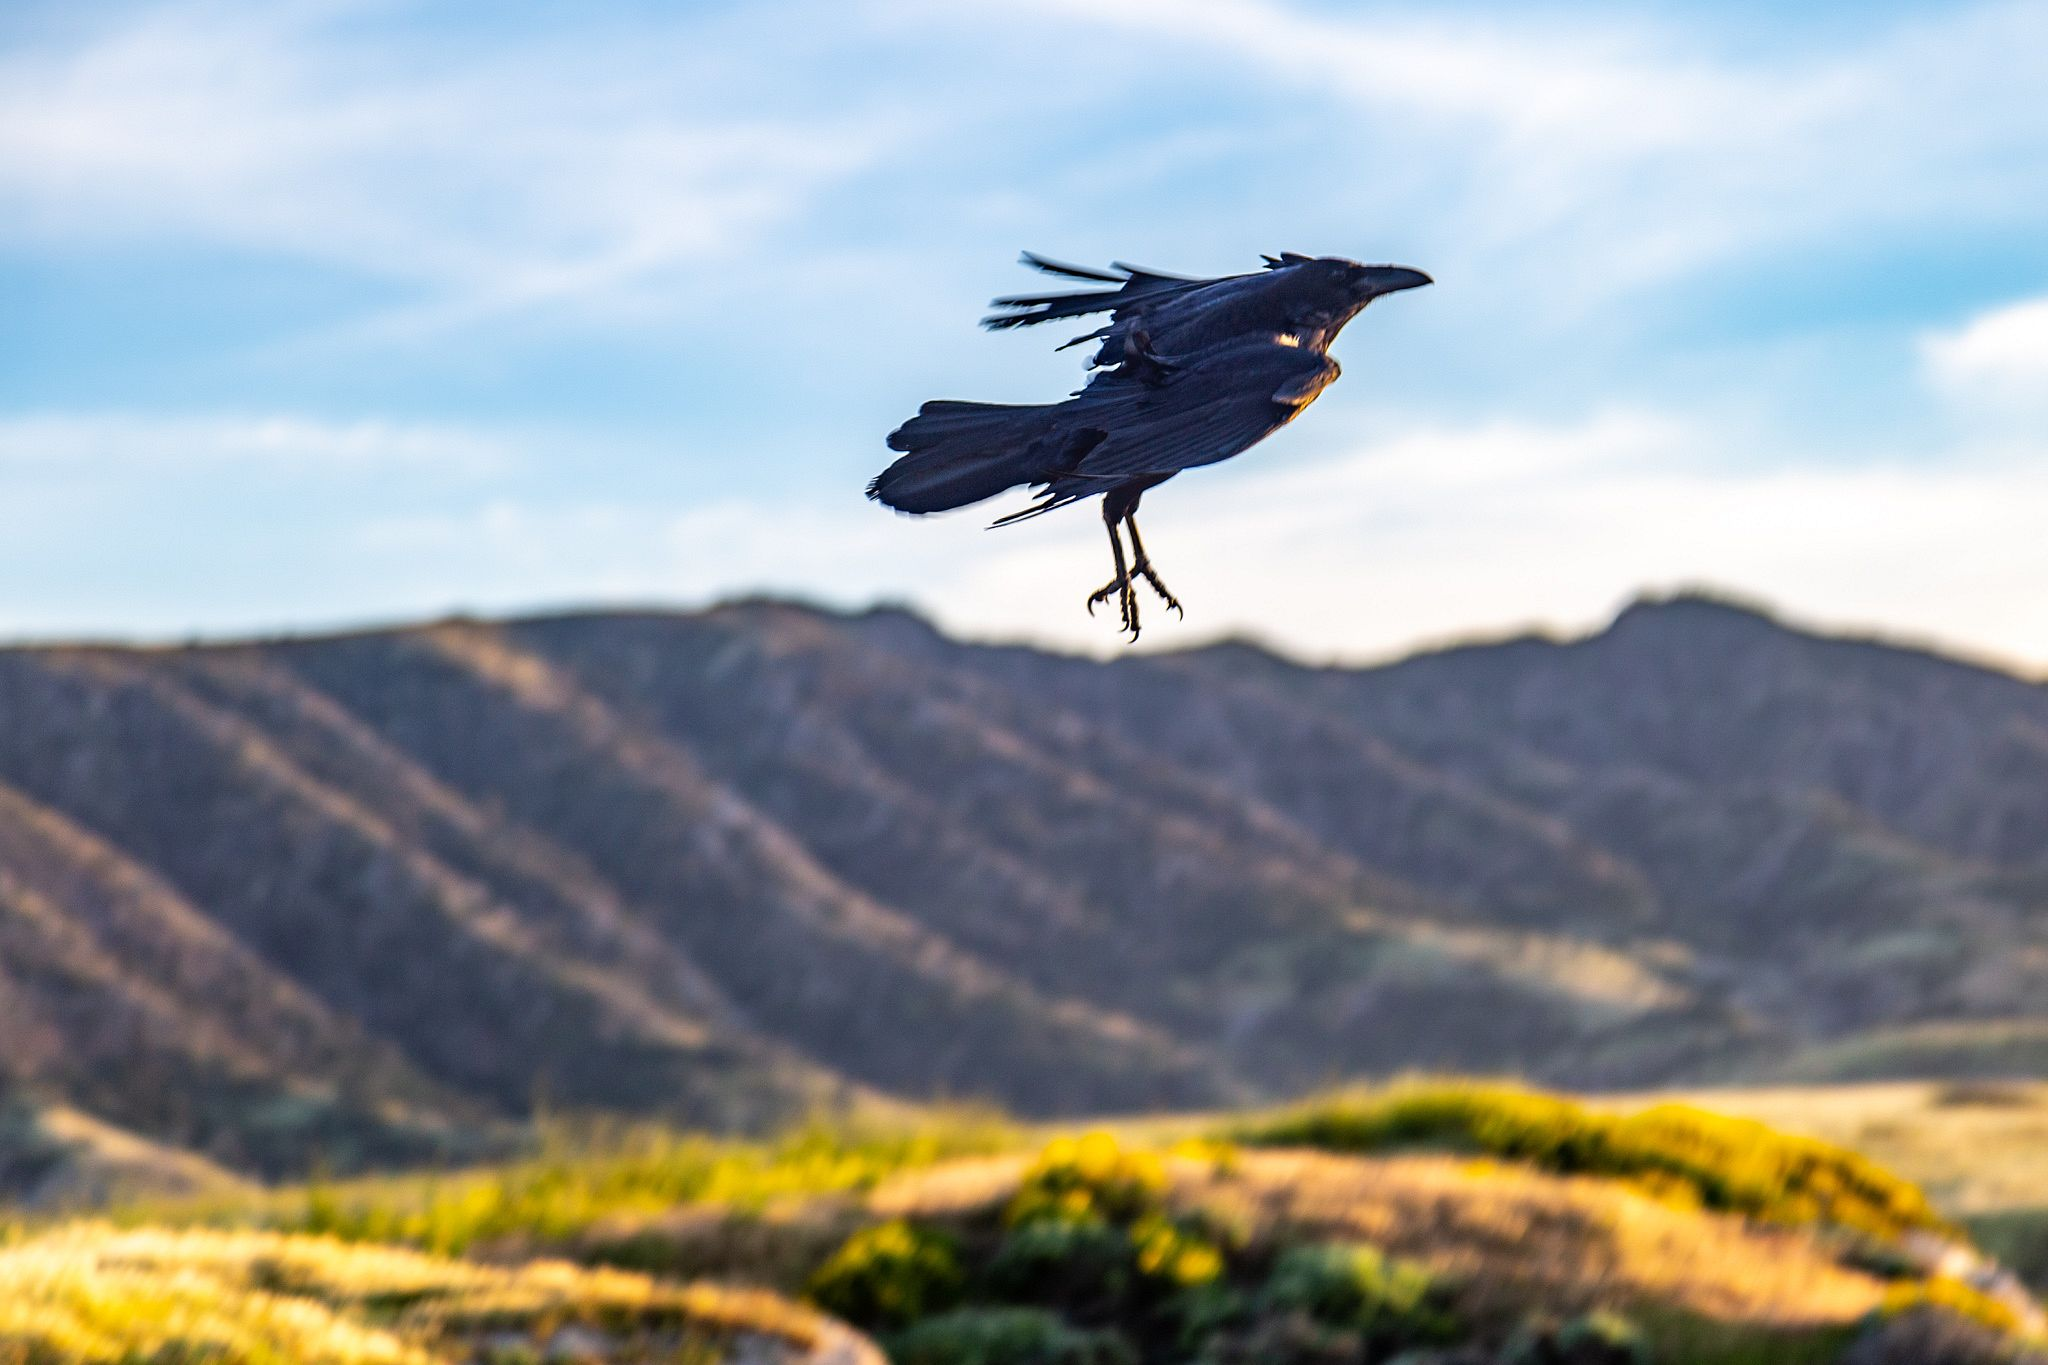 Birds flying in the wind